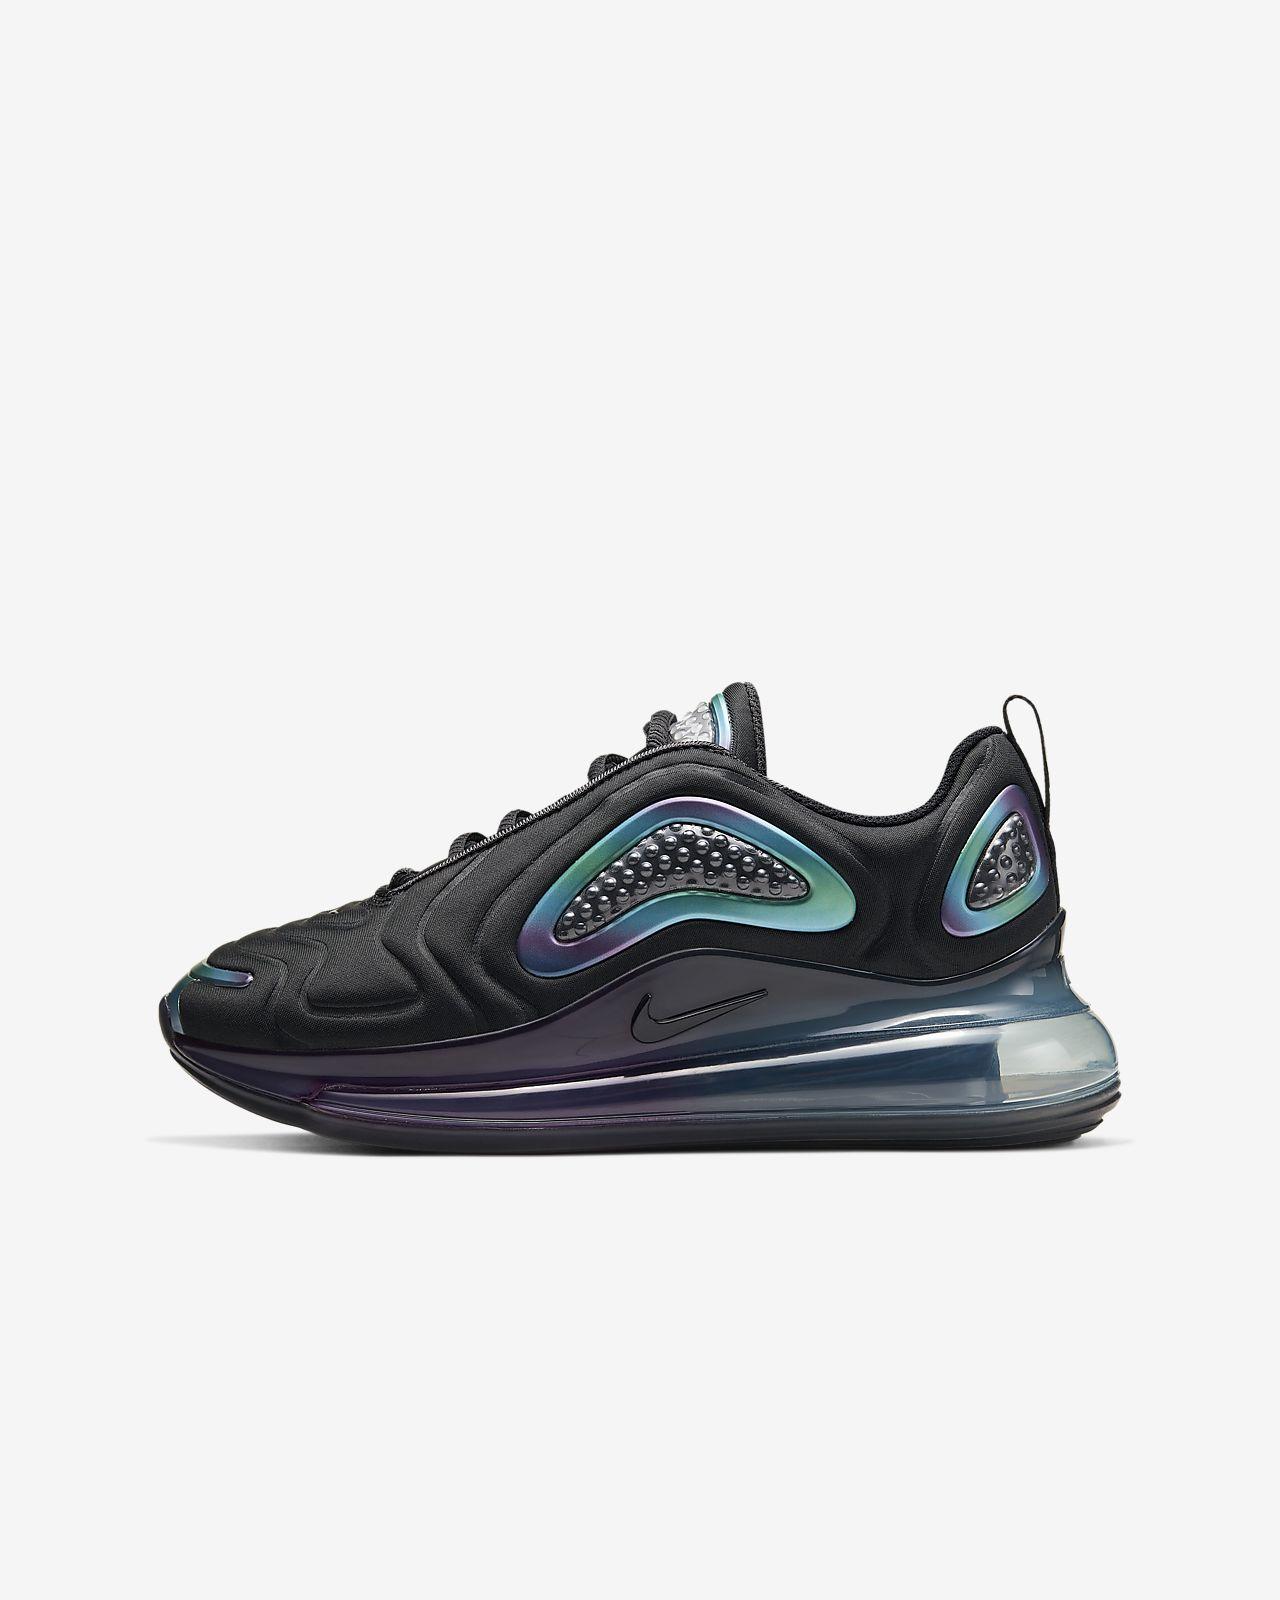 Nike Air Max 720 Kinderschoen